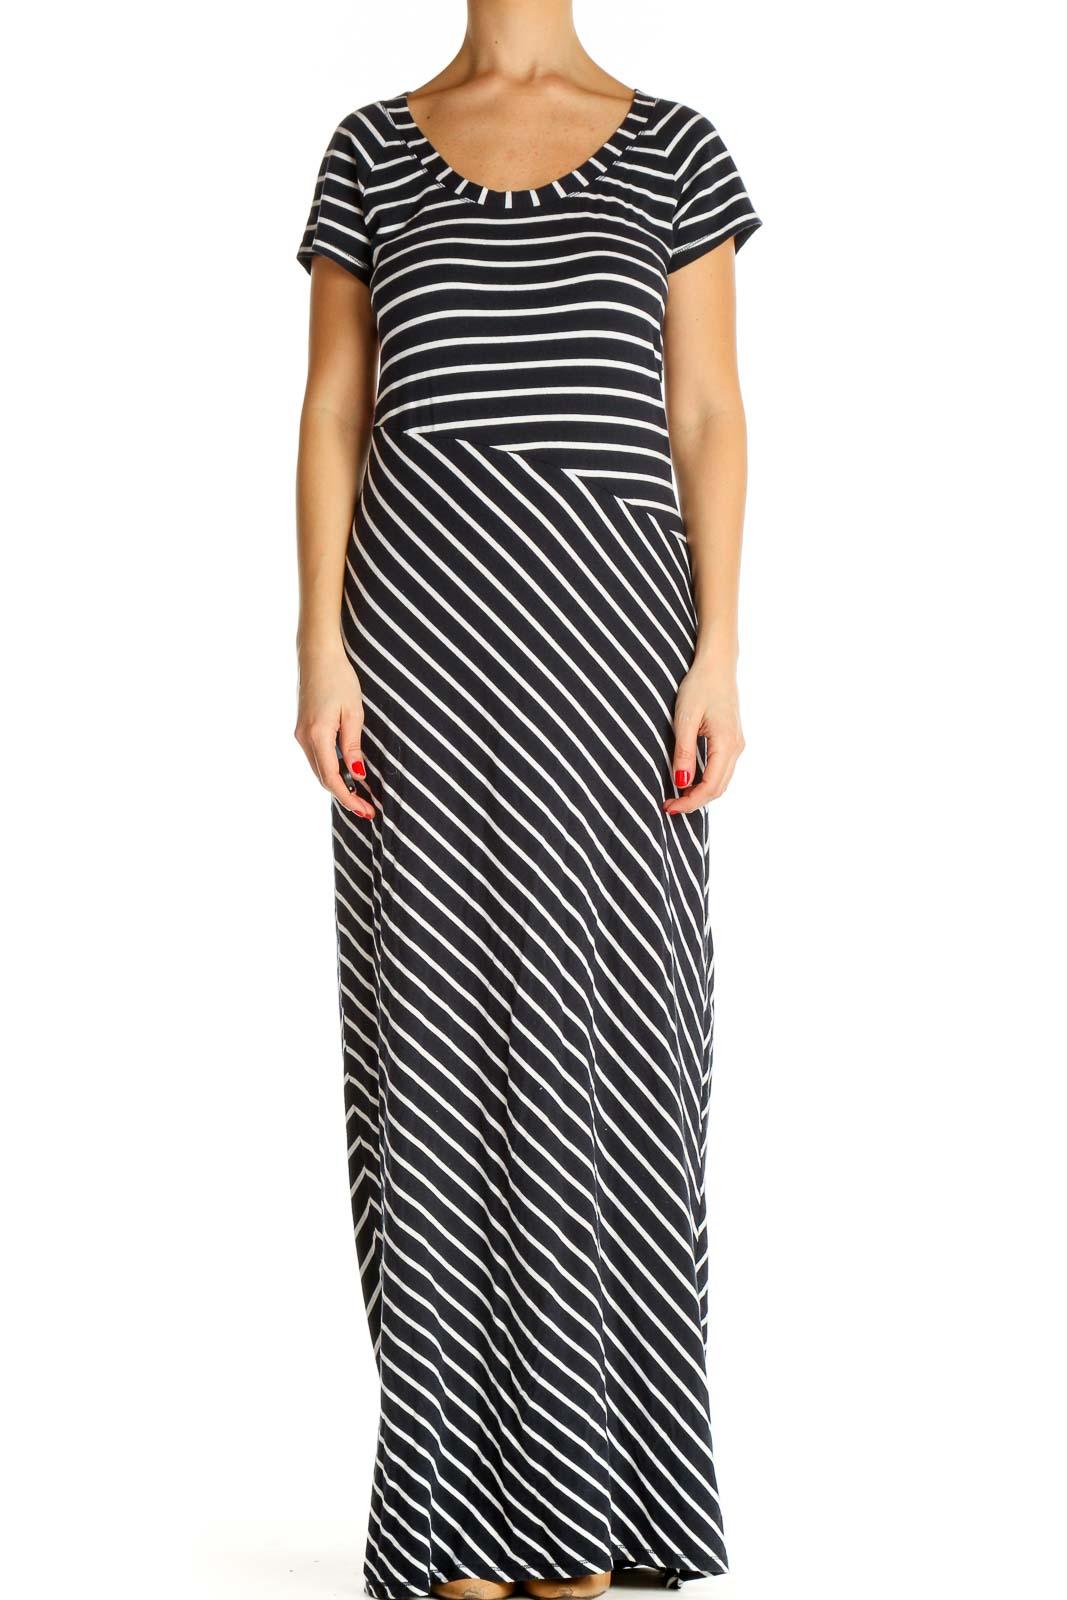 Blue Striped Classic Column Dress Front